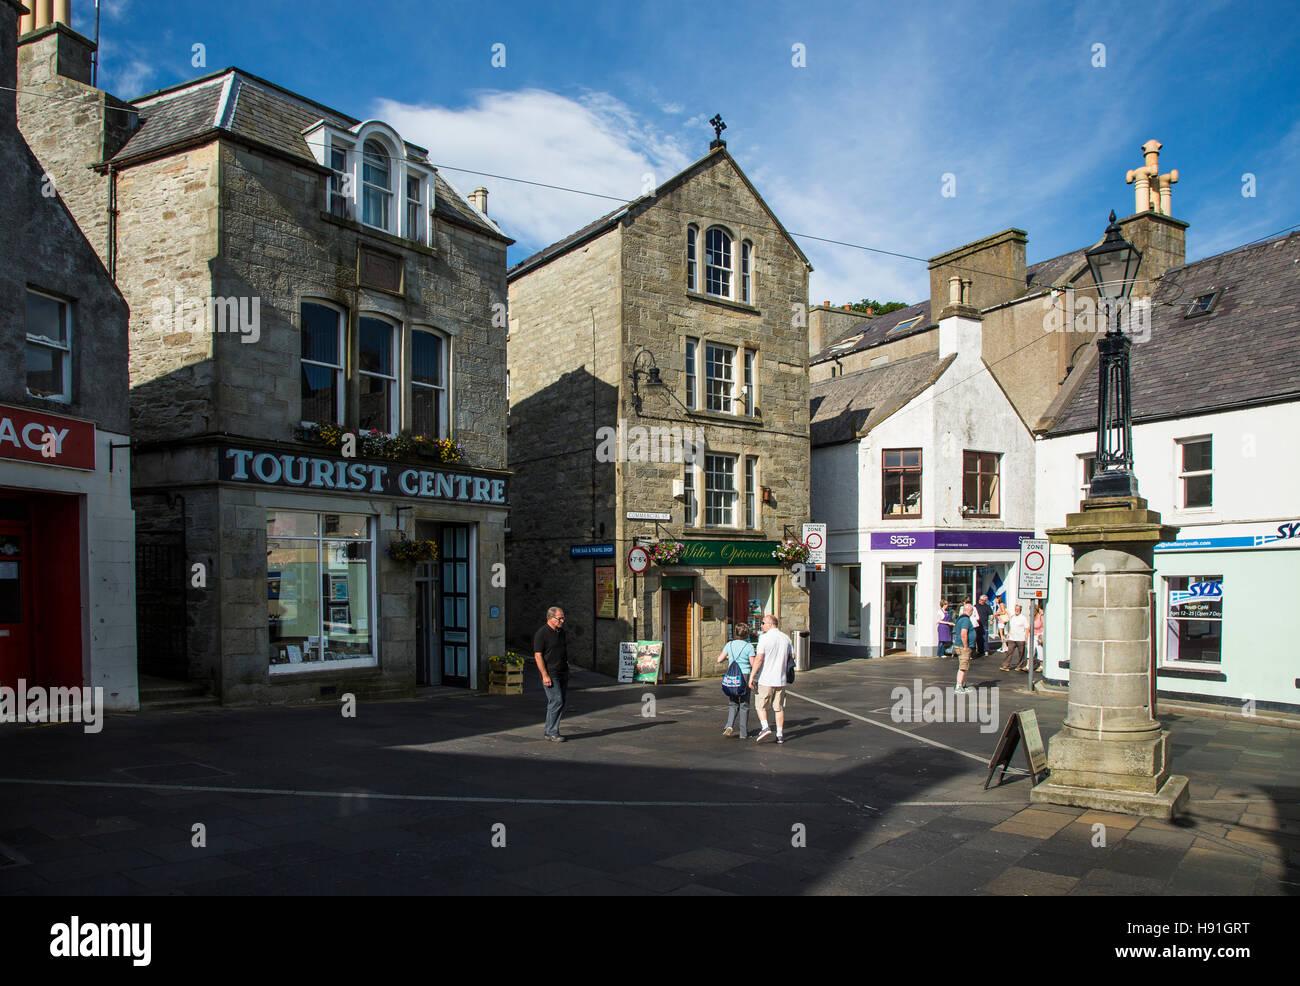 Town Centre, Lerwick, Shetland Islands, Scotland - Stock Image